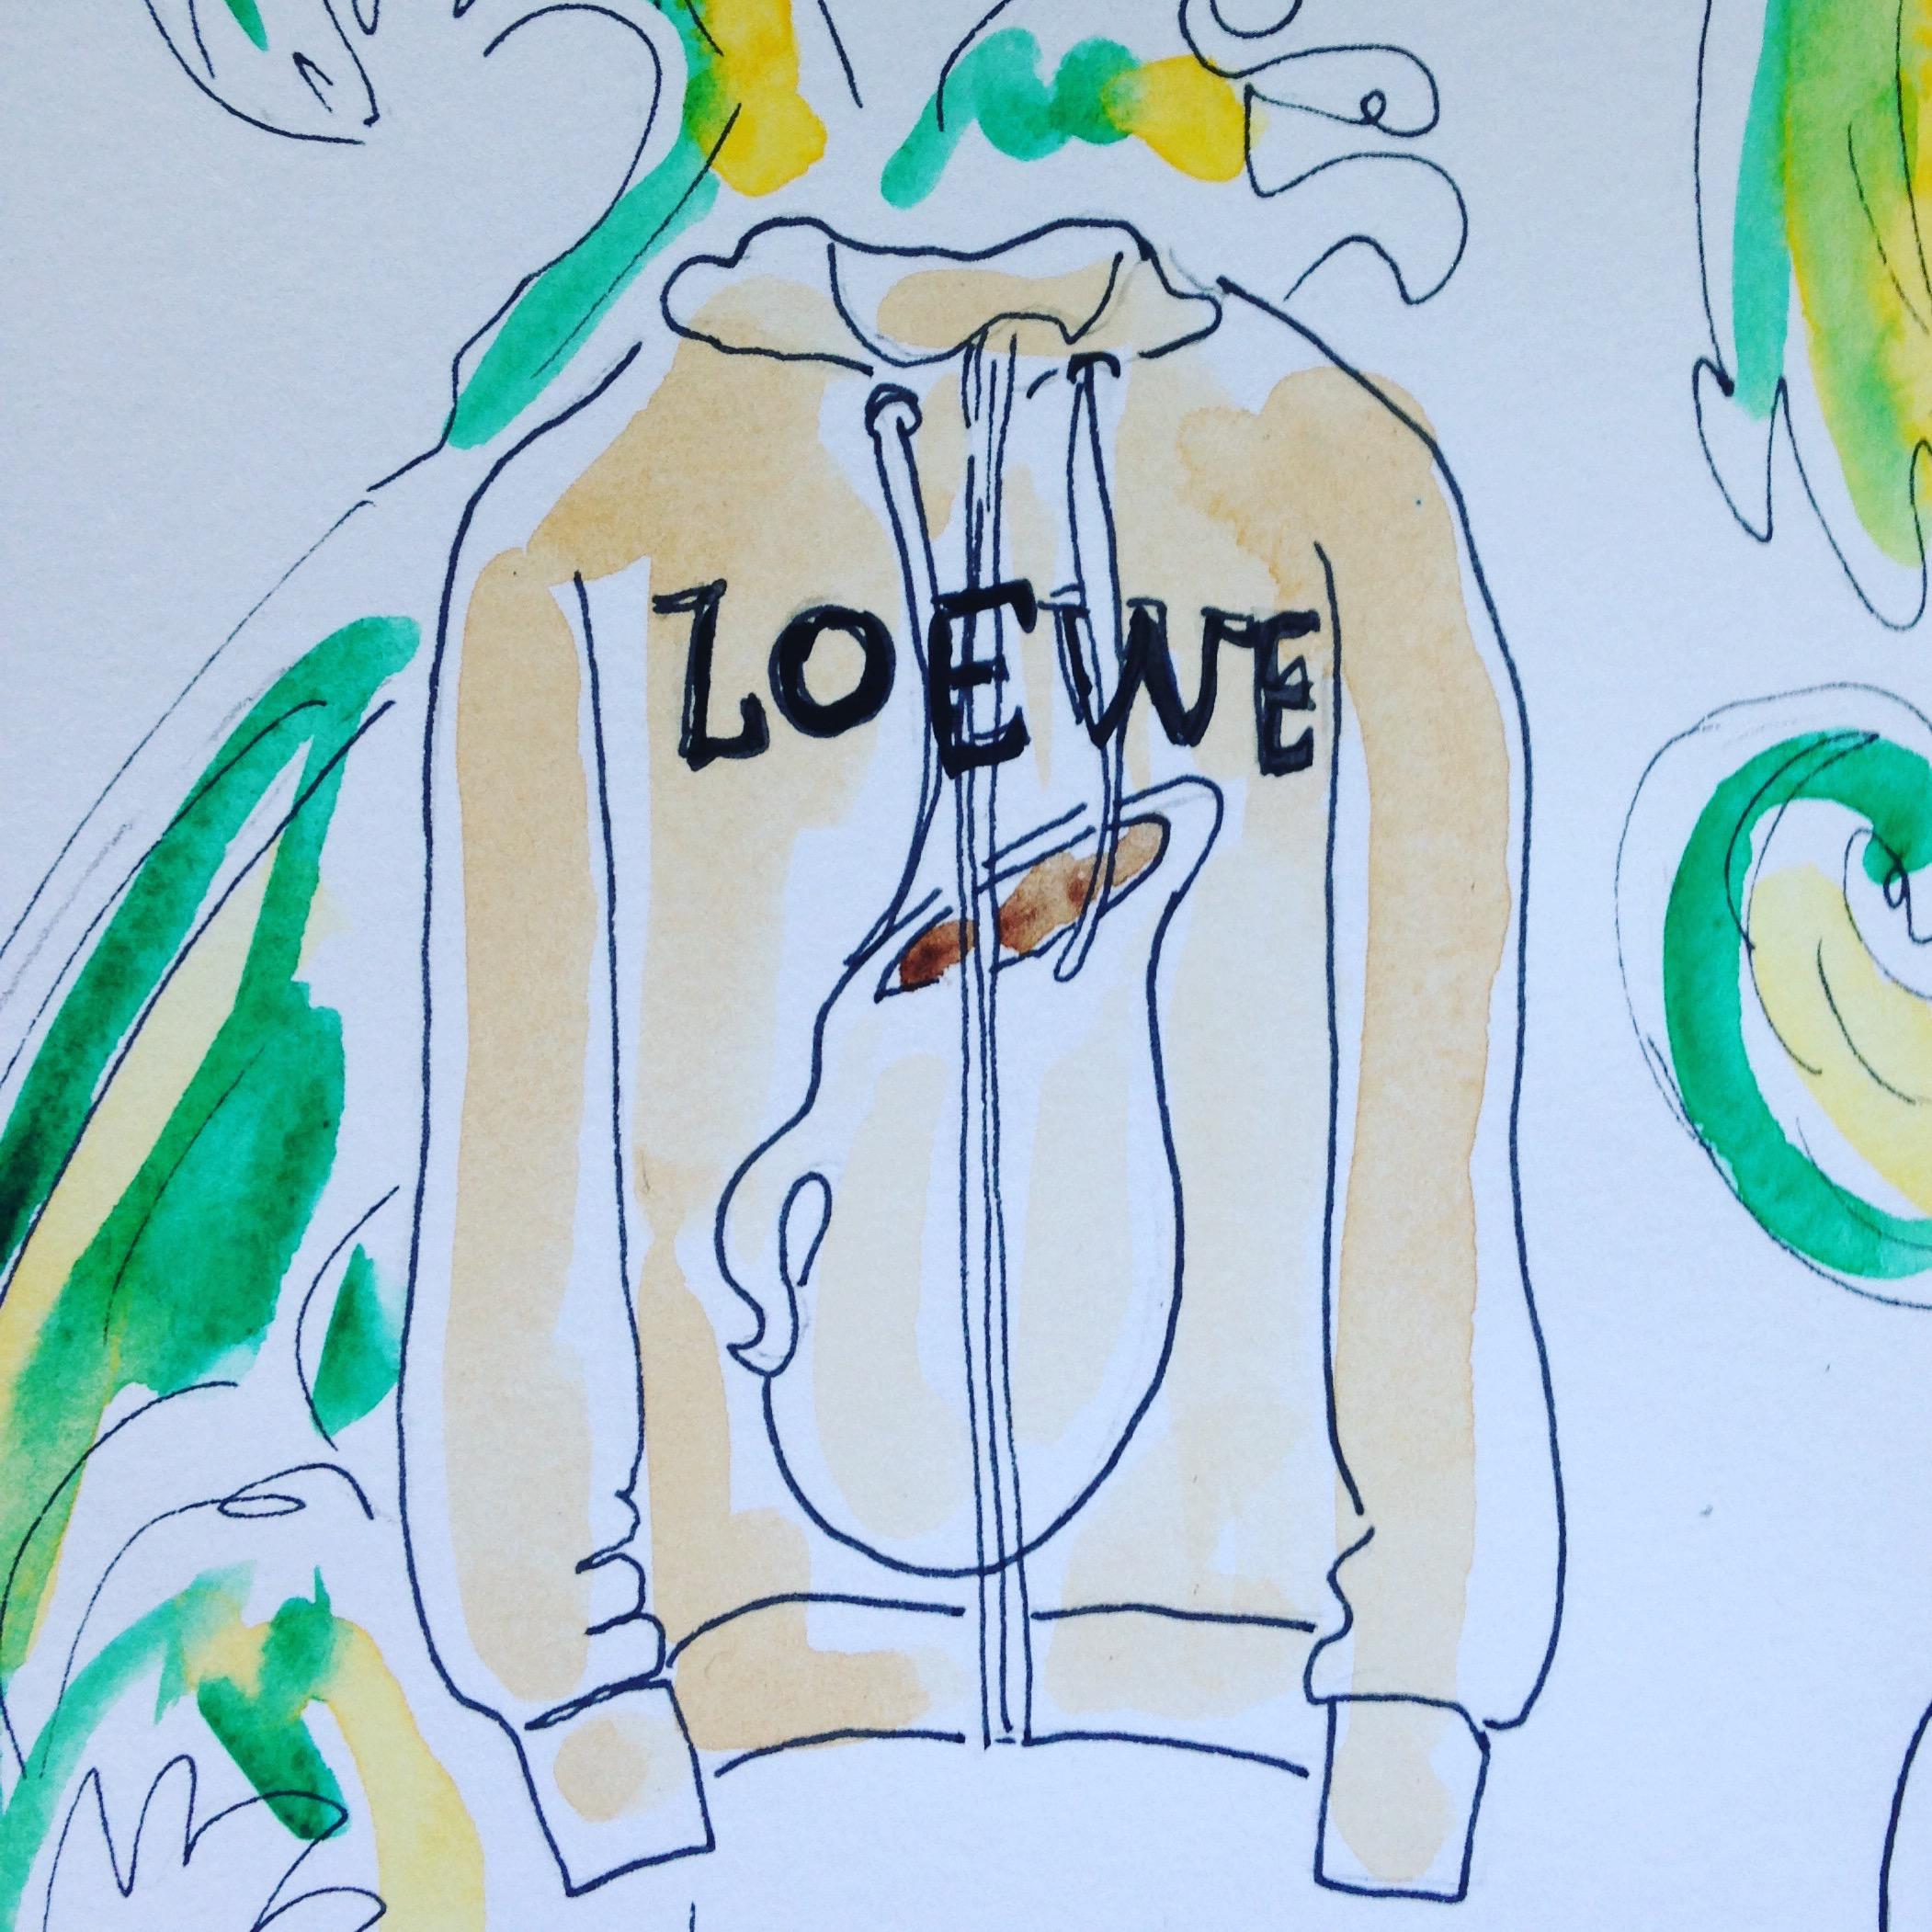 Loewe hoodie inspired by Francisco de Zurbarán's Still Life with Vessels at Prado Madrid.